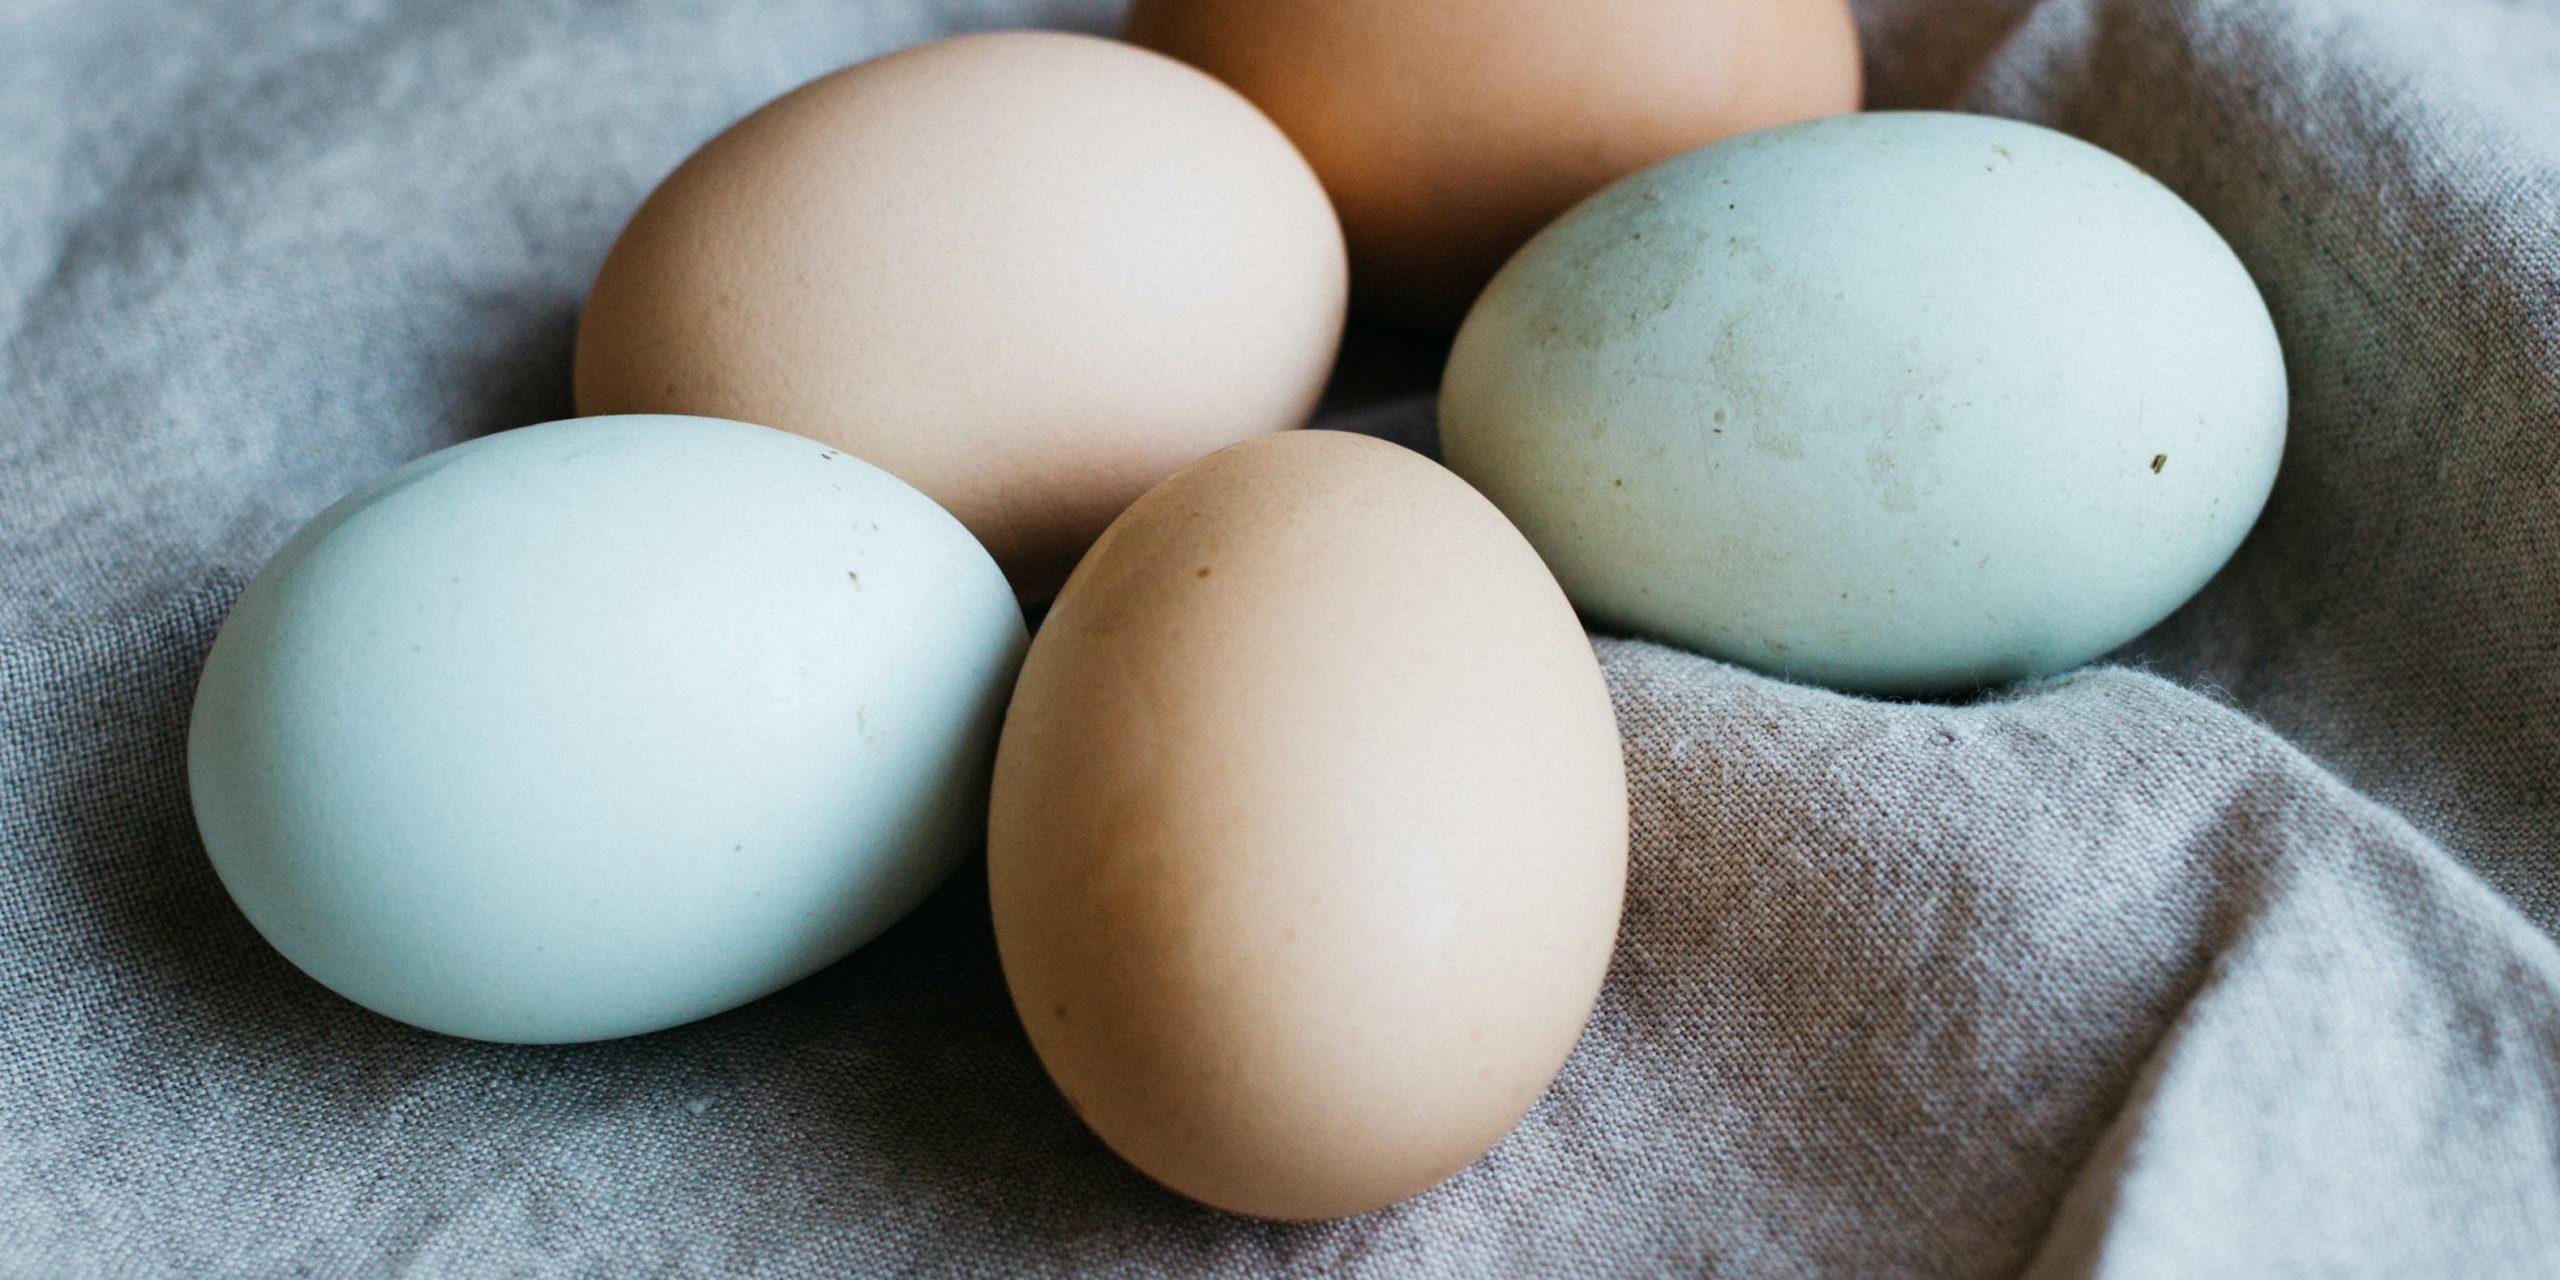 buy local eggs